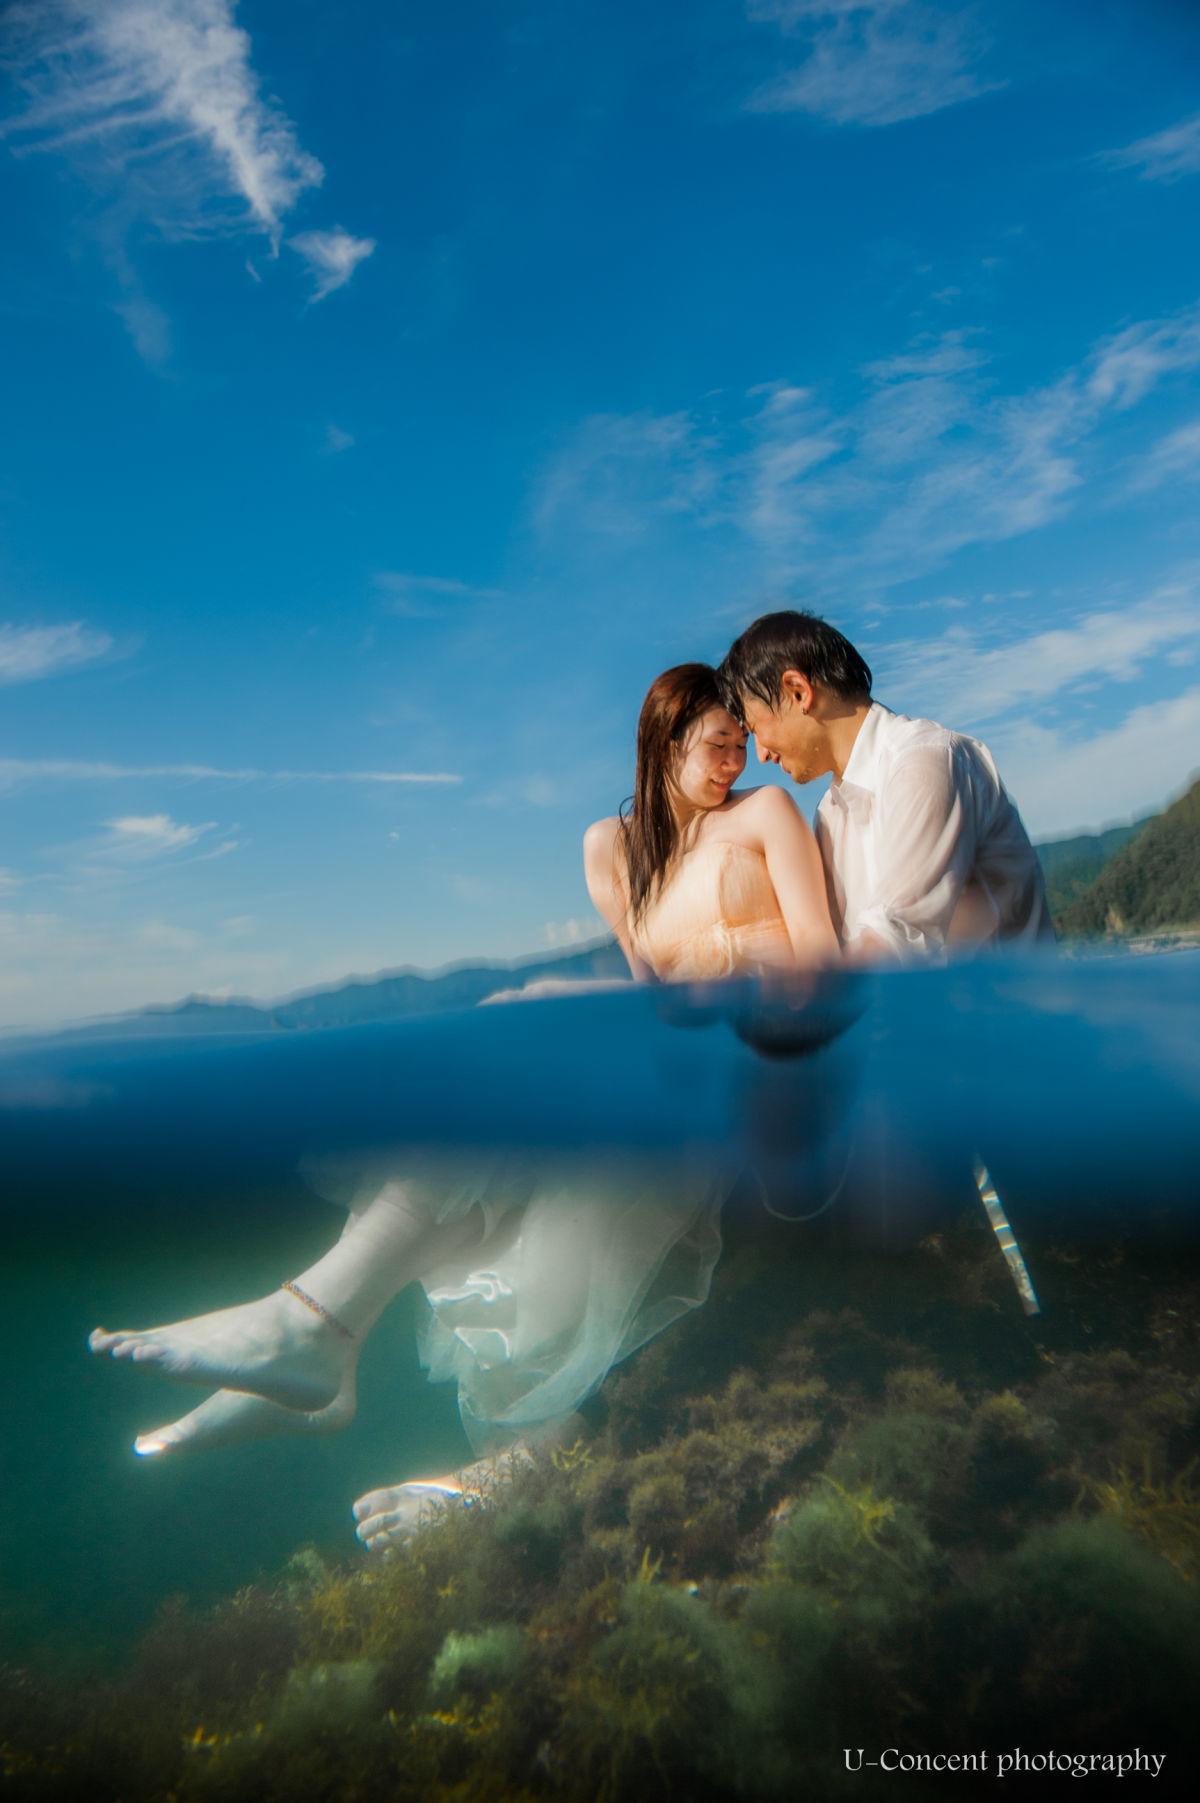 U-CONCENT (香川裕貴)が撮影したビーチでのウェディングフォト